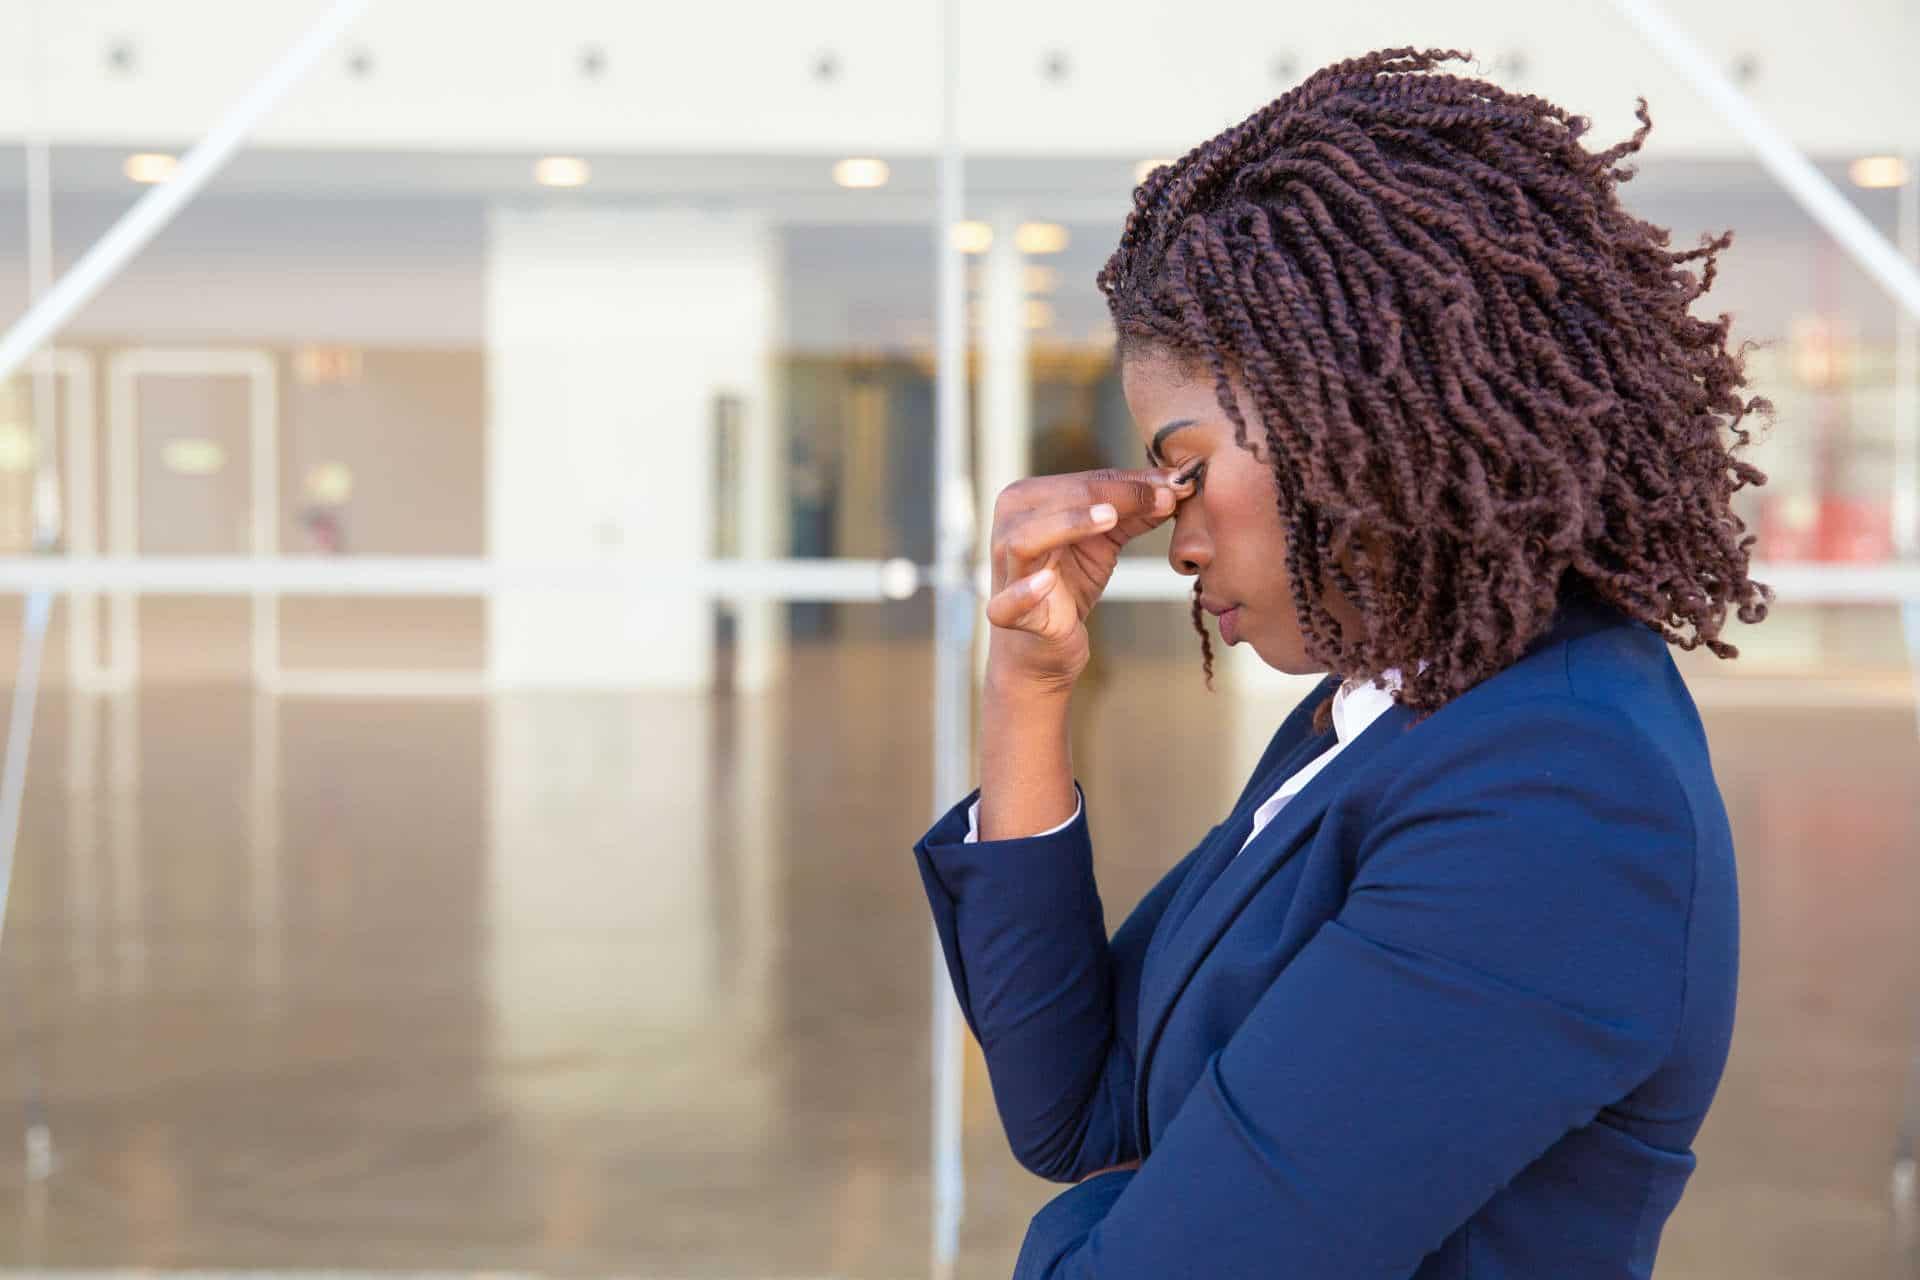 Serious upset female employee thinking over bad news